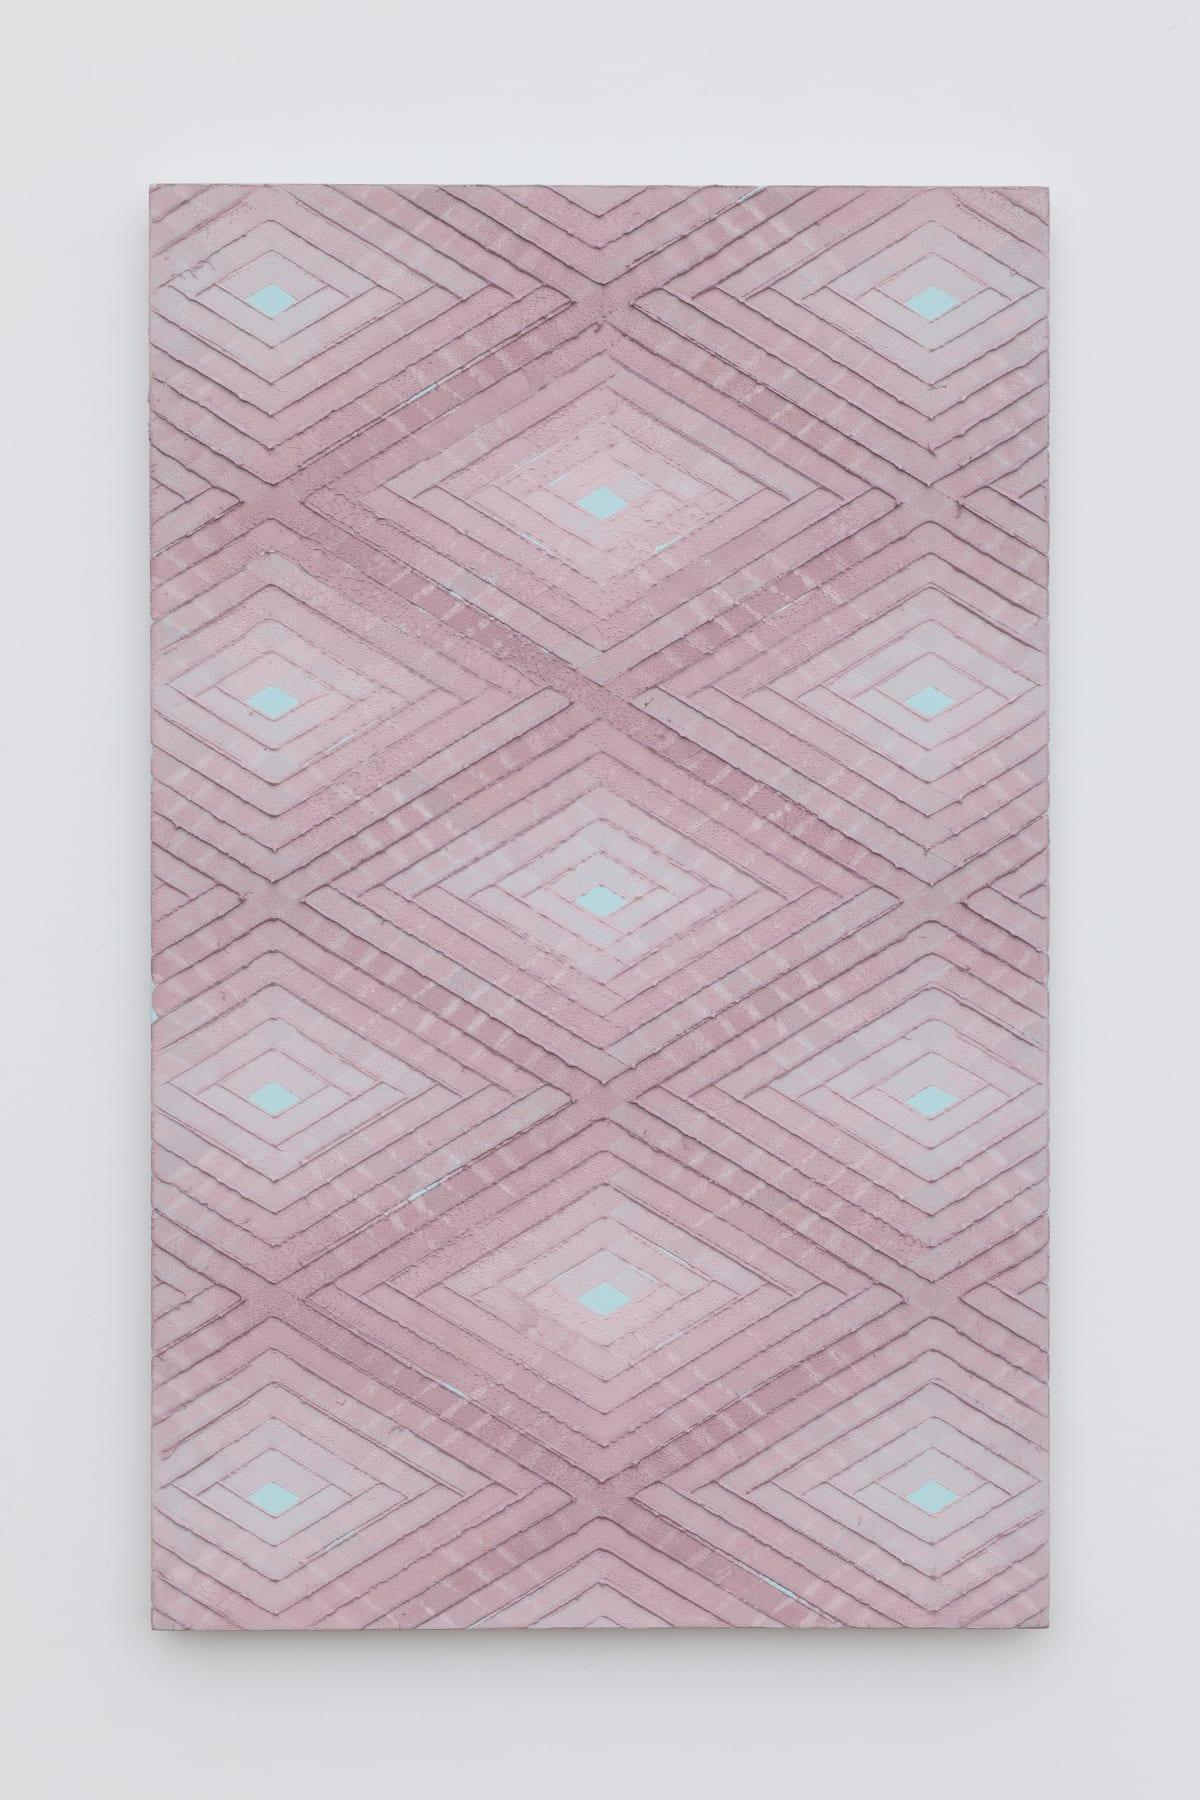 Will Cruickshank, Pink on turquoise 1, 2019